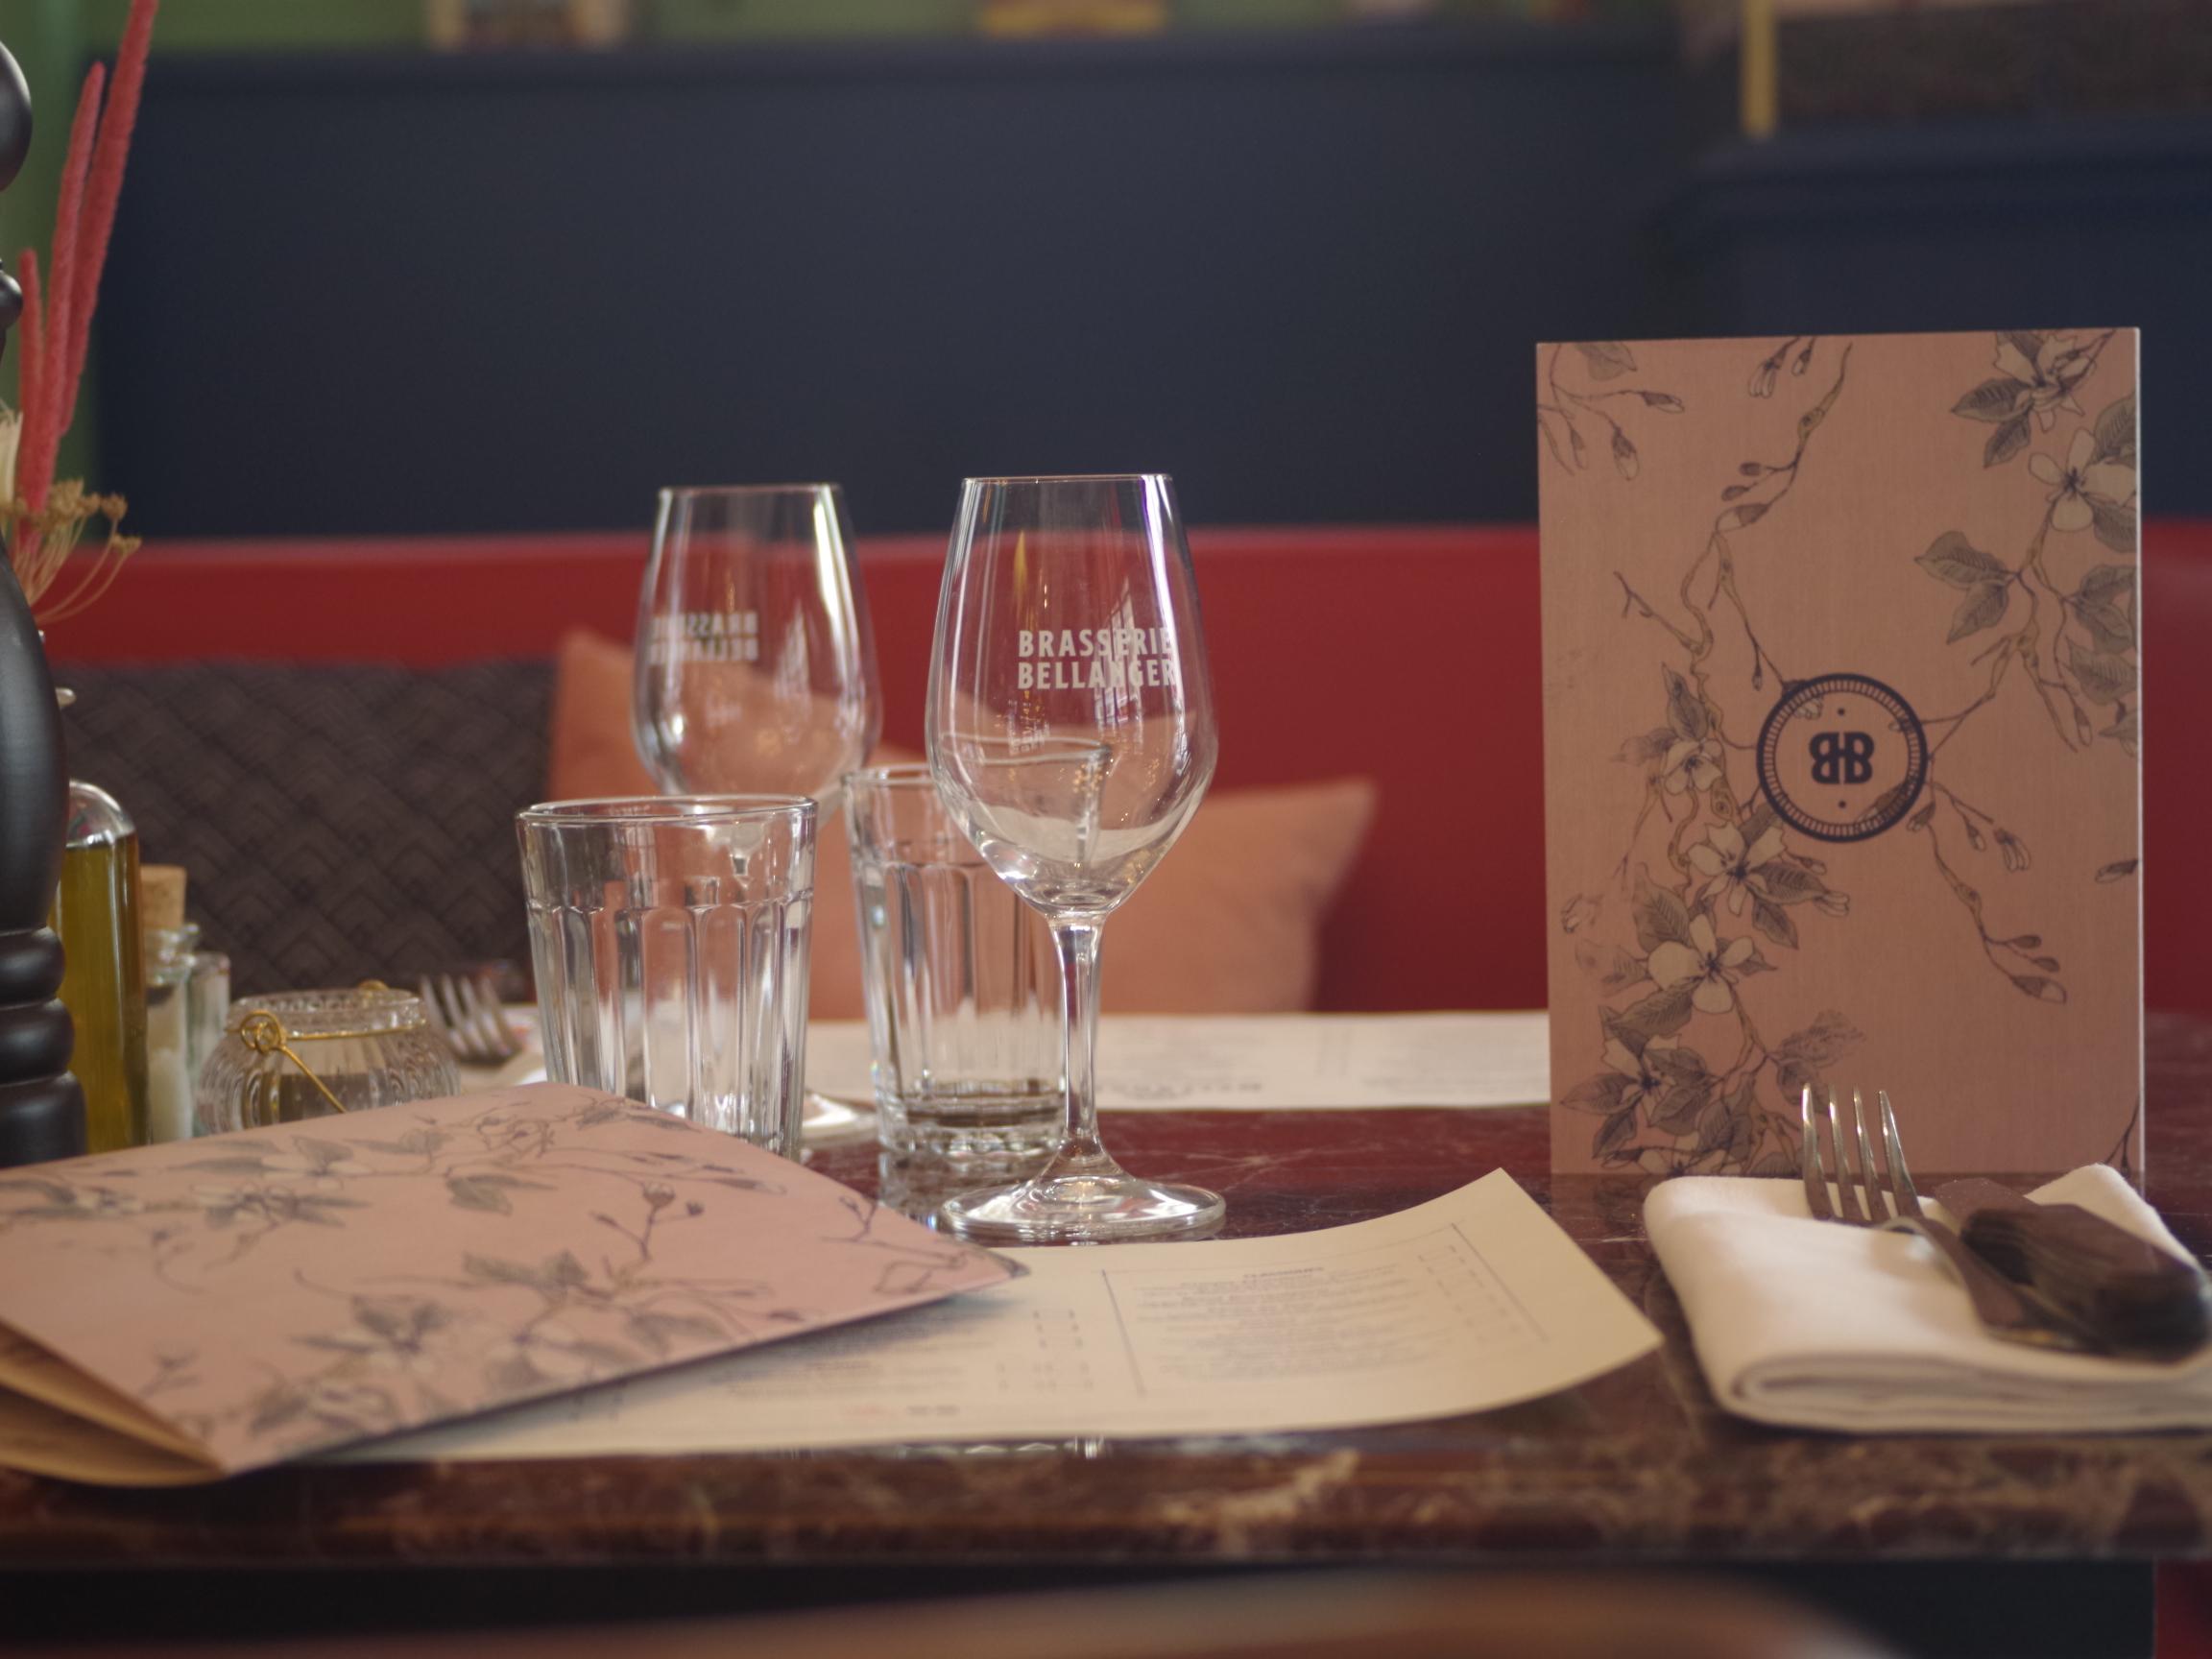 brasseries bellanger deco paris .jpg